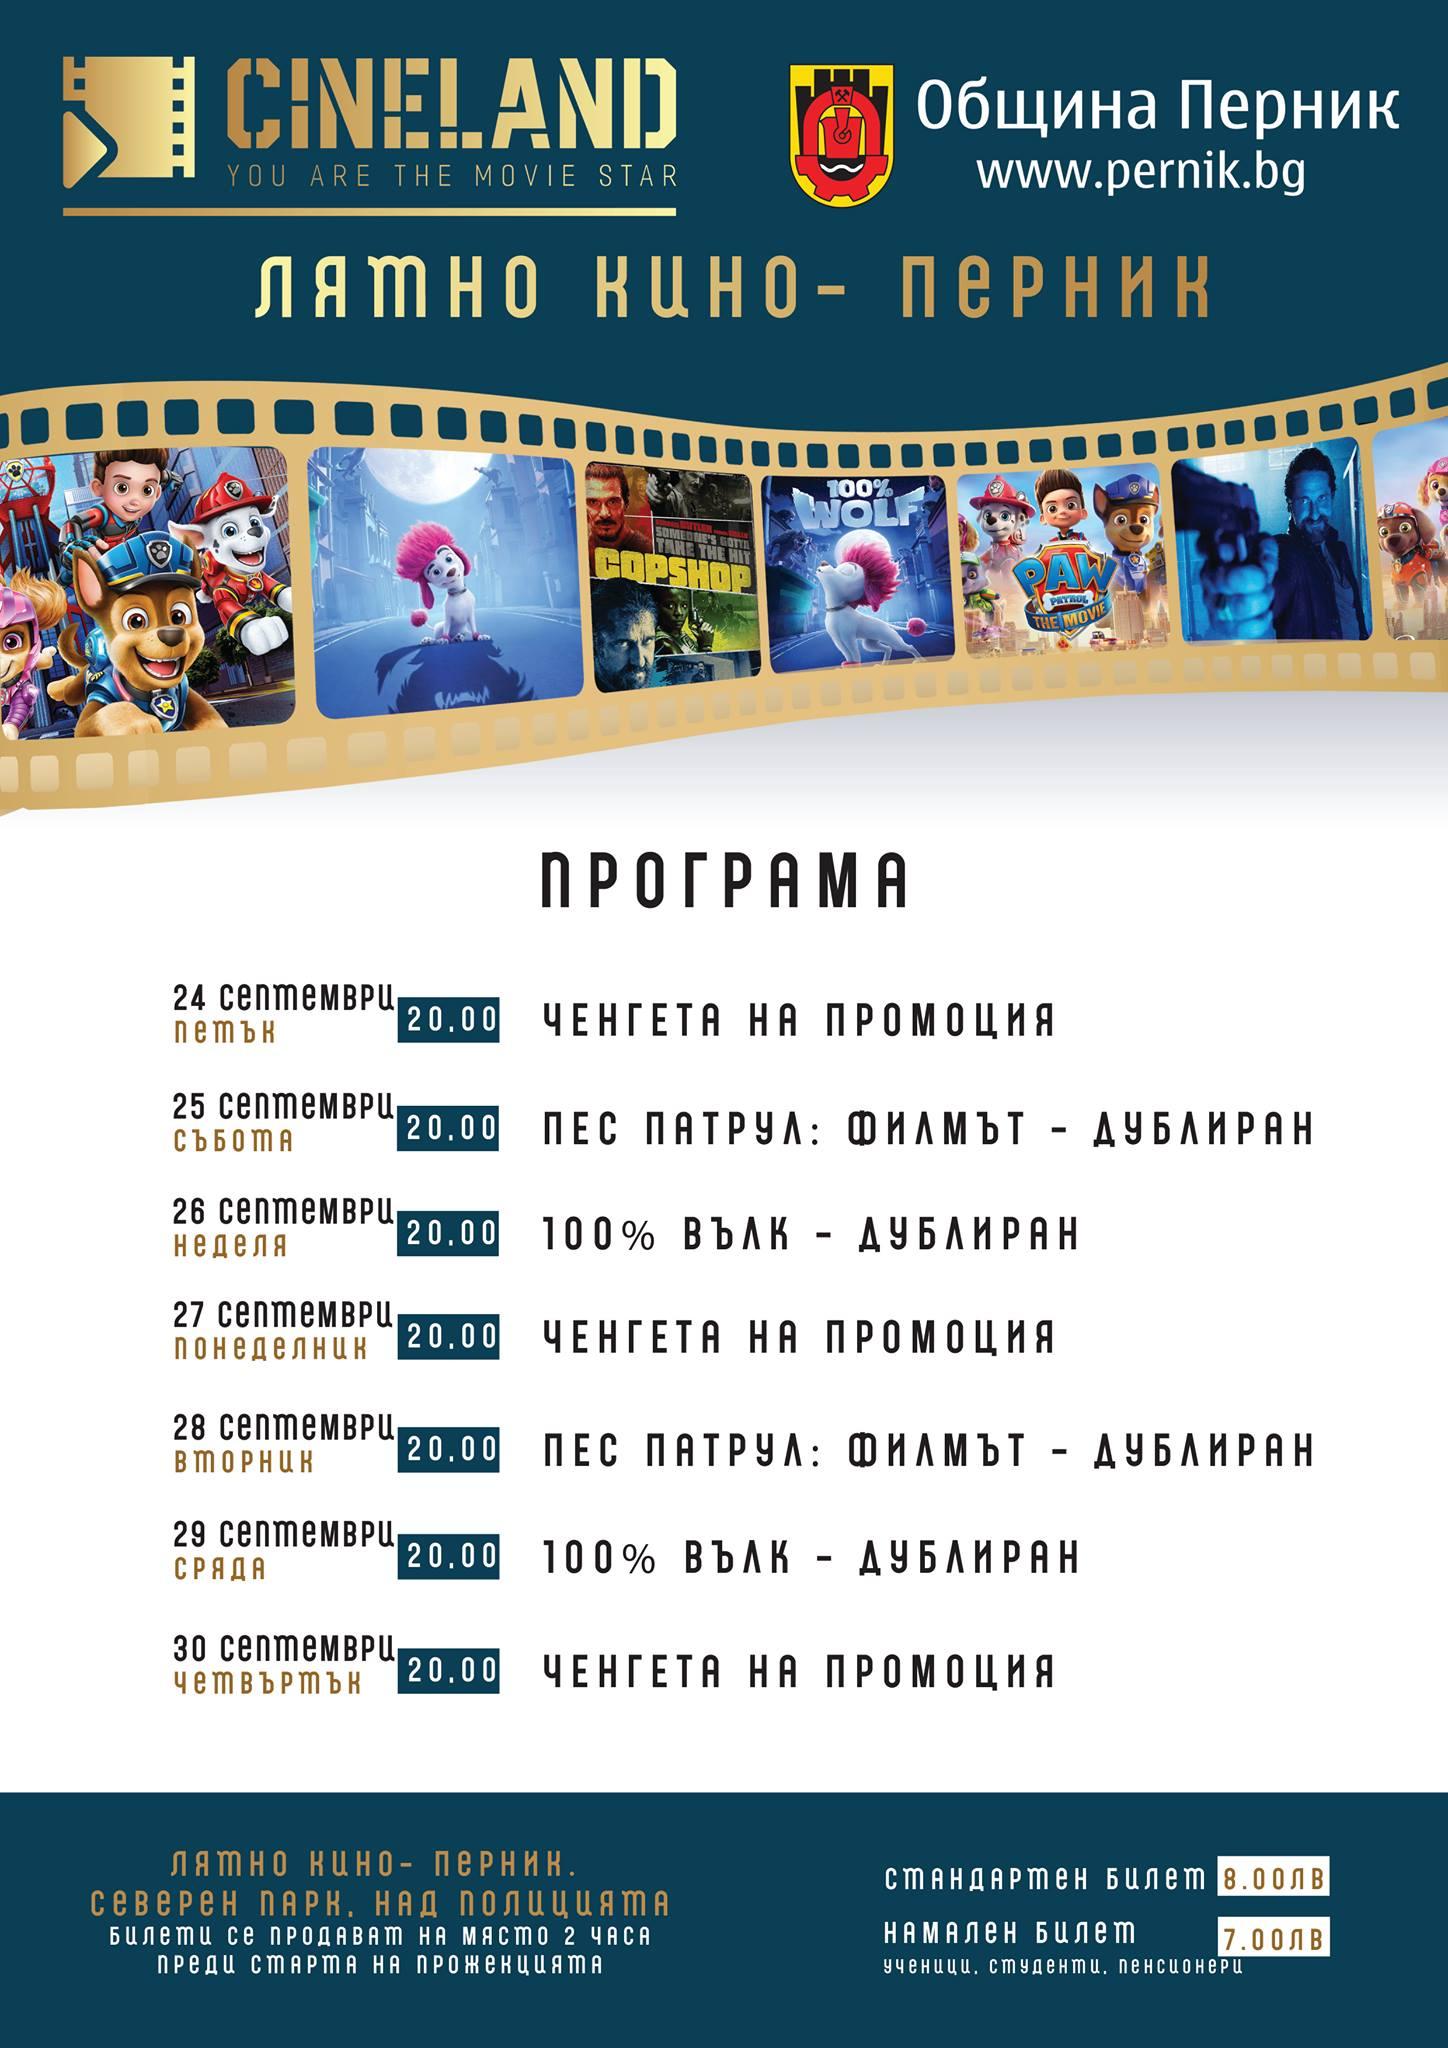 CineLand Перник: Кино програма - 24-30 септември 2021